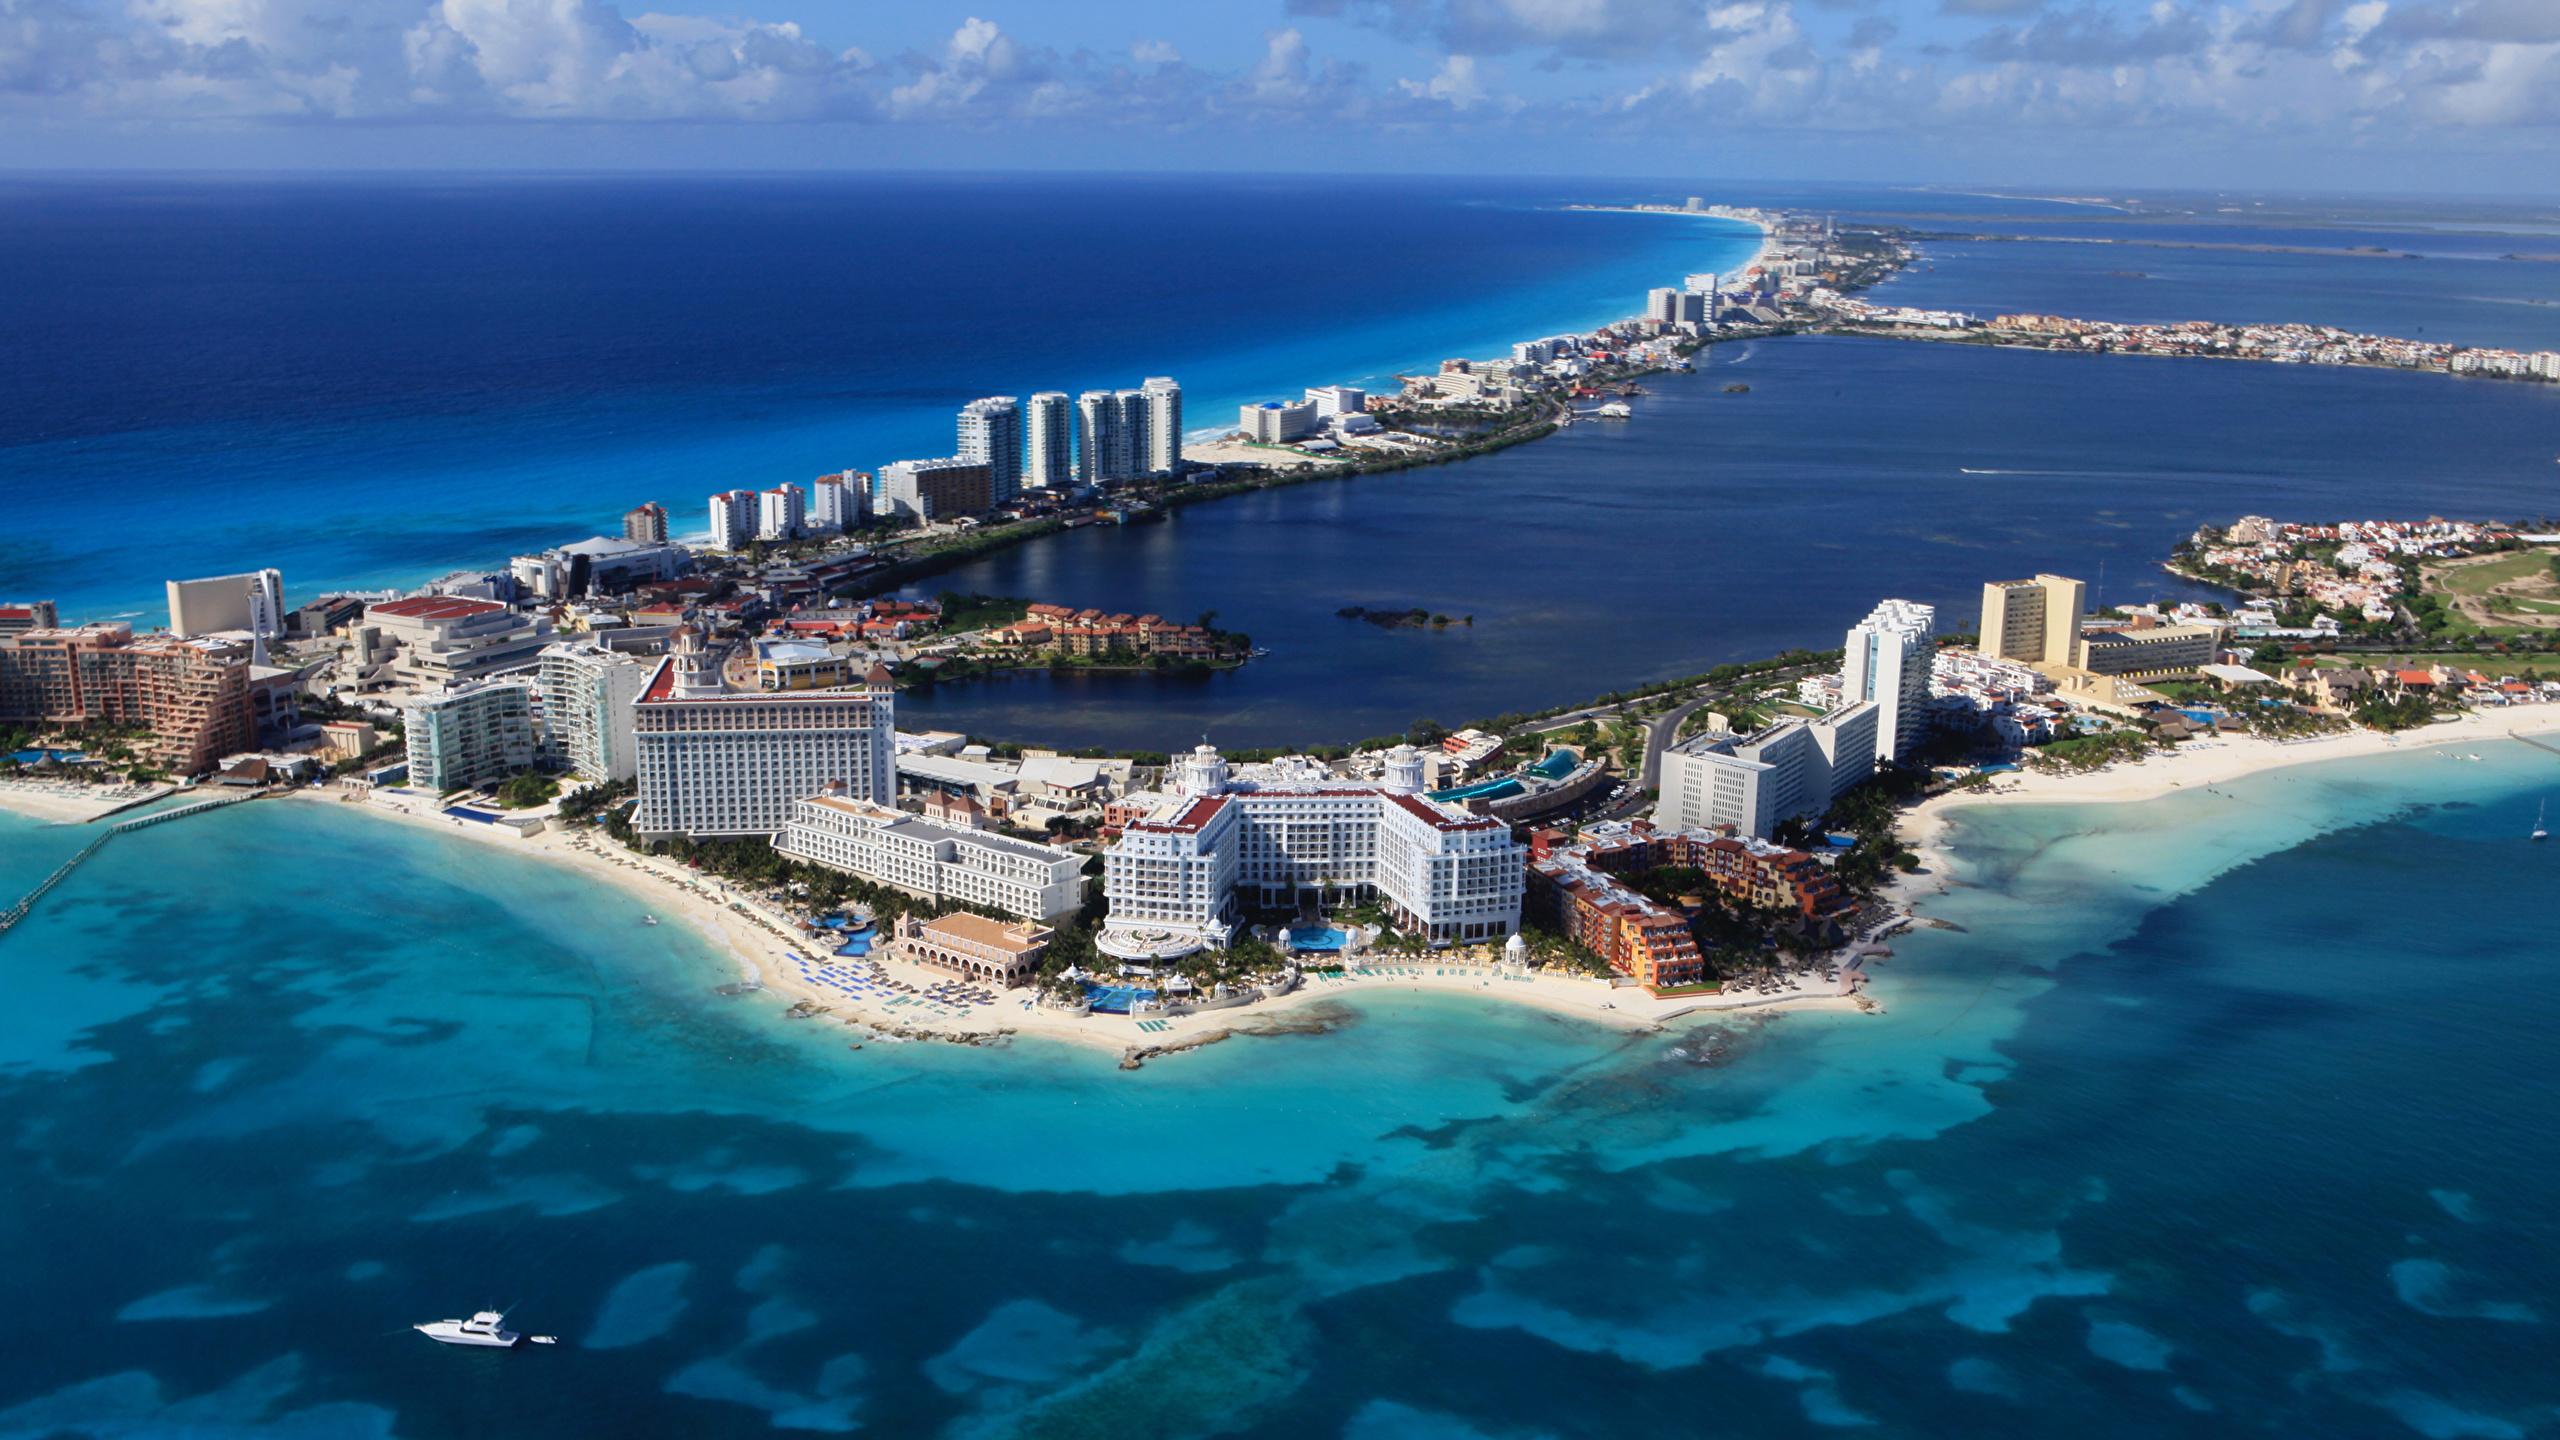 Picture Mexico Cancun Sea Coast Cities Building 2560x1440